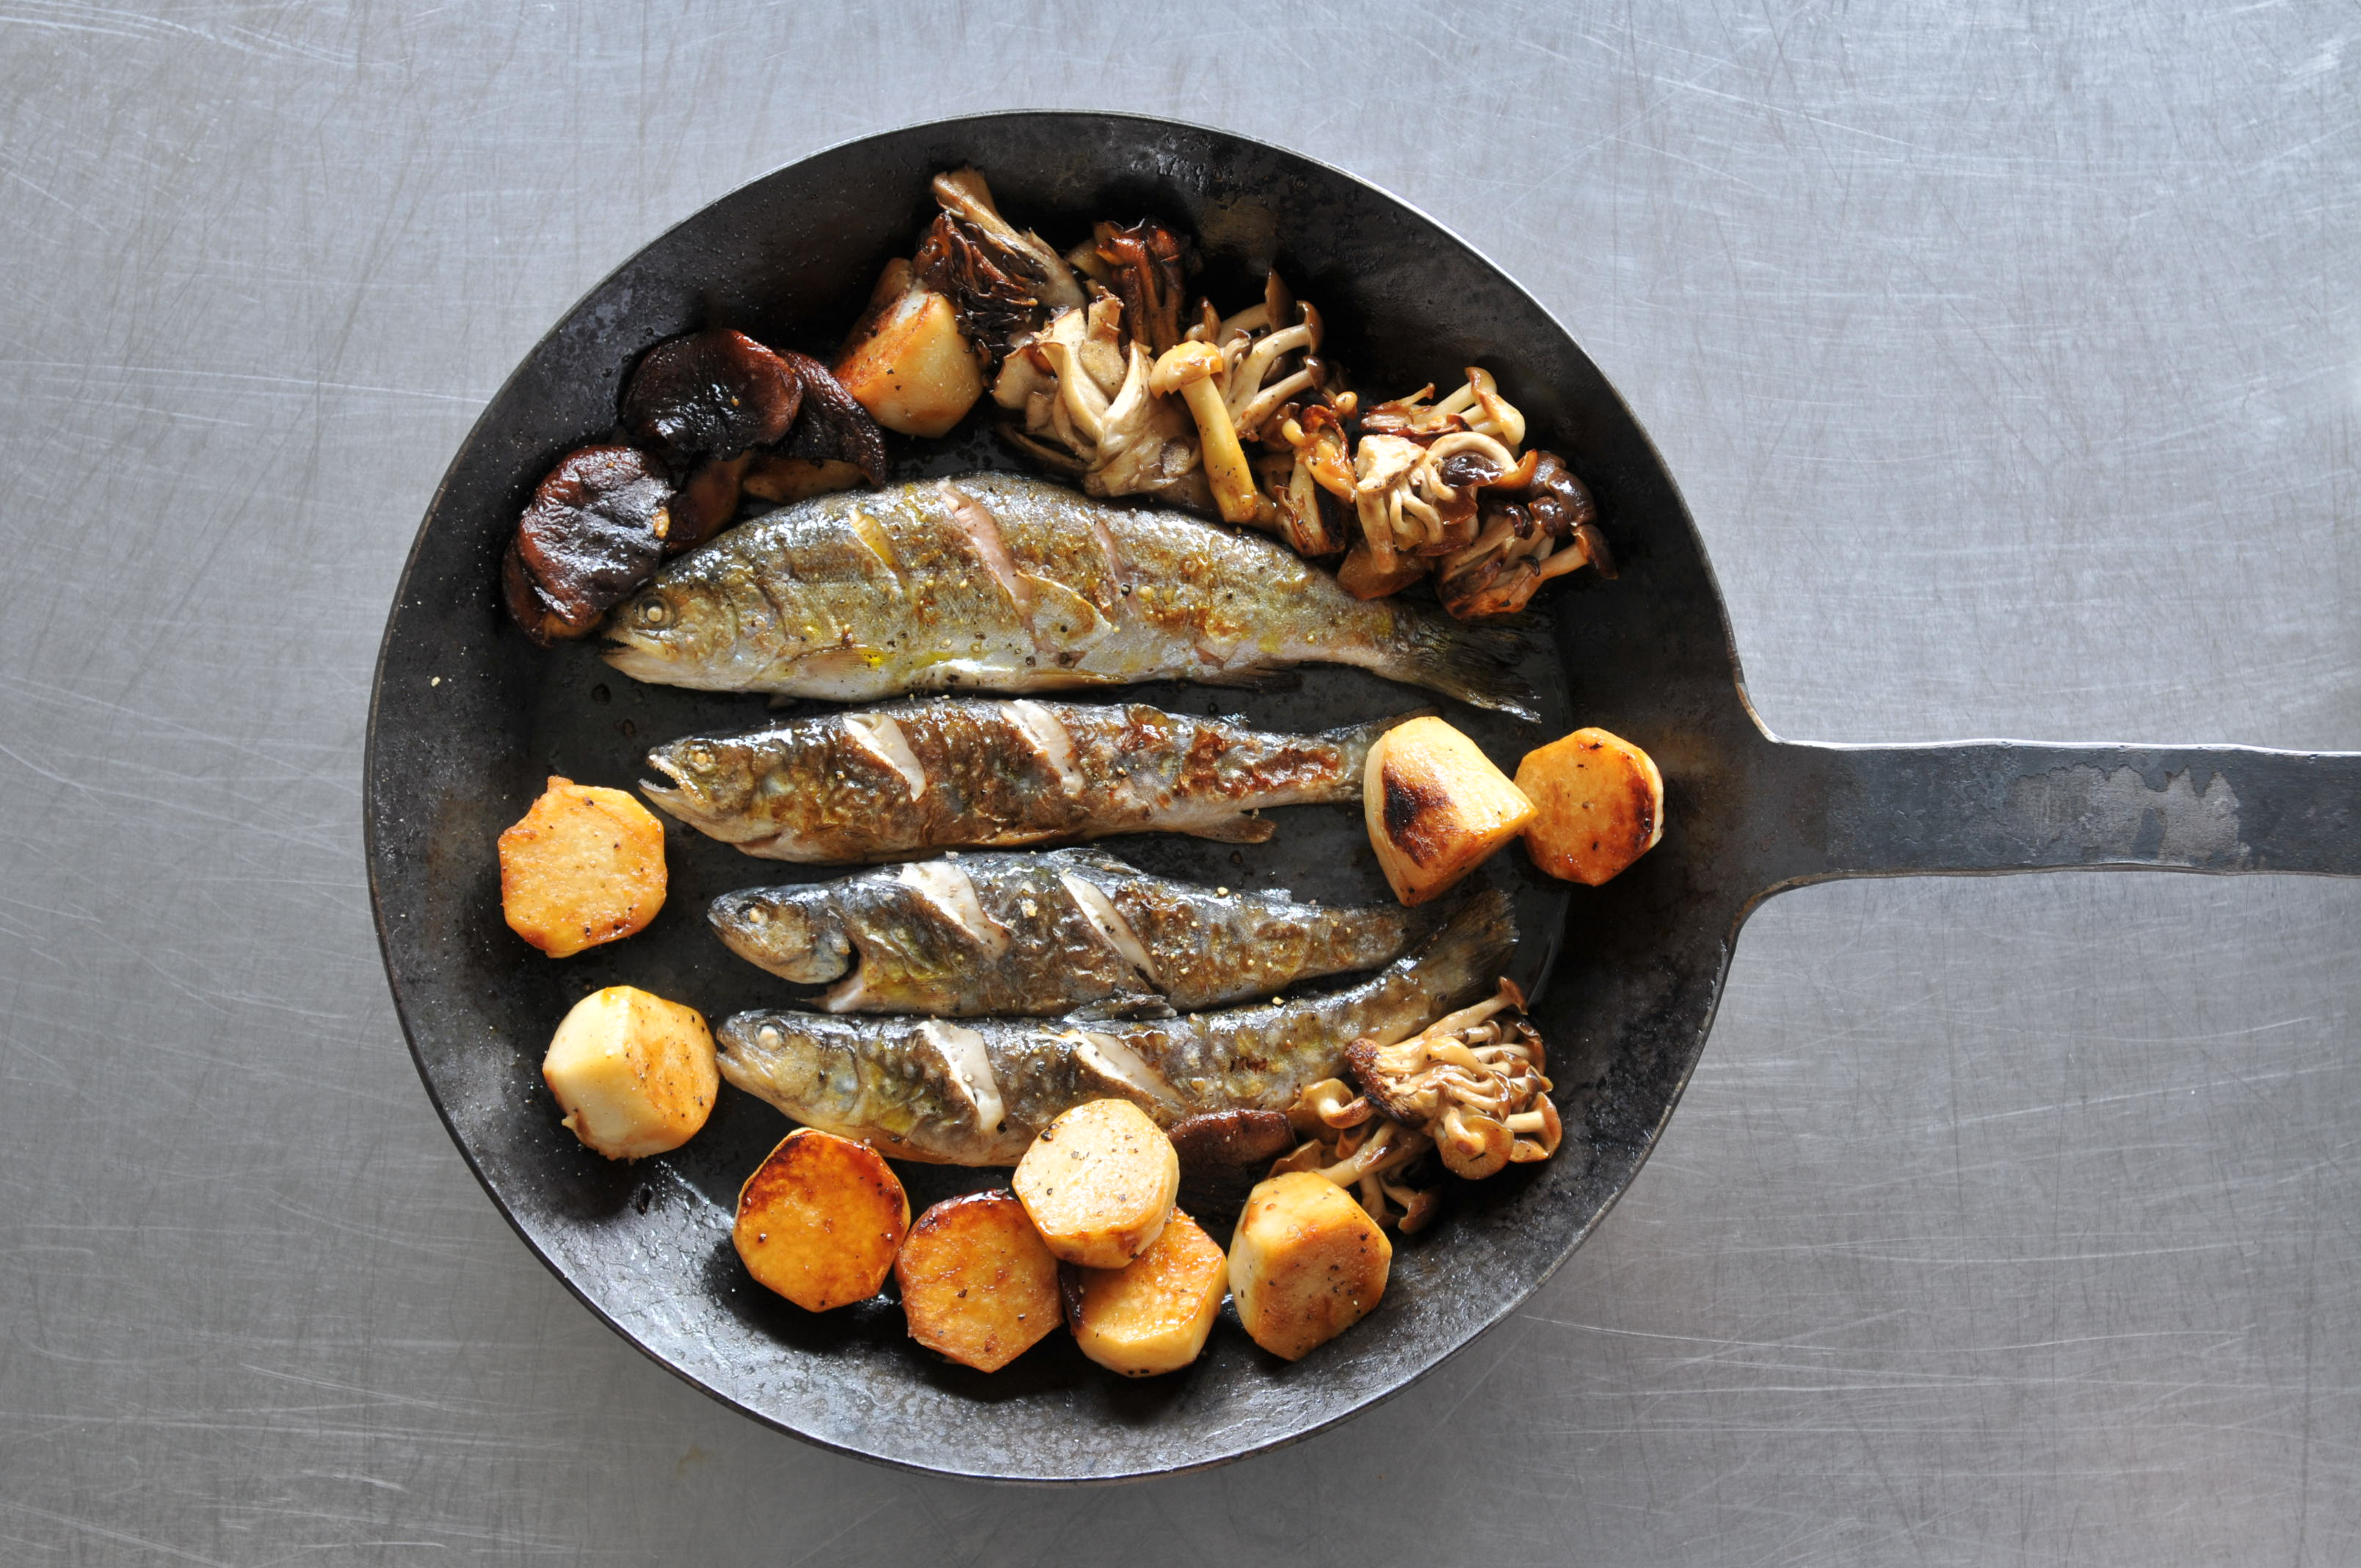 turk pan에 대한 이미지 검색결과